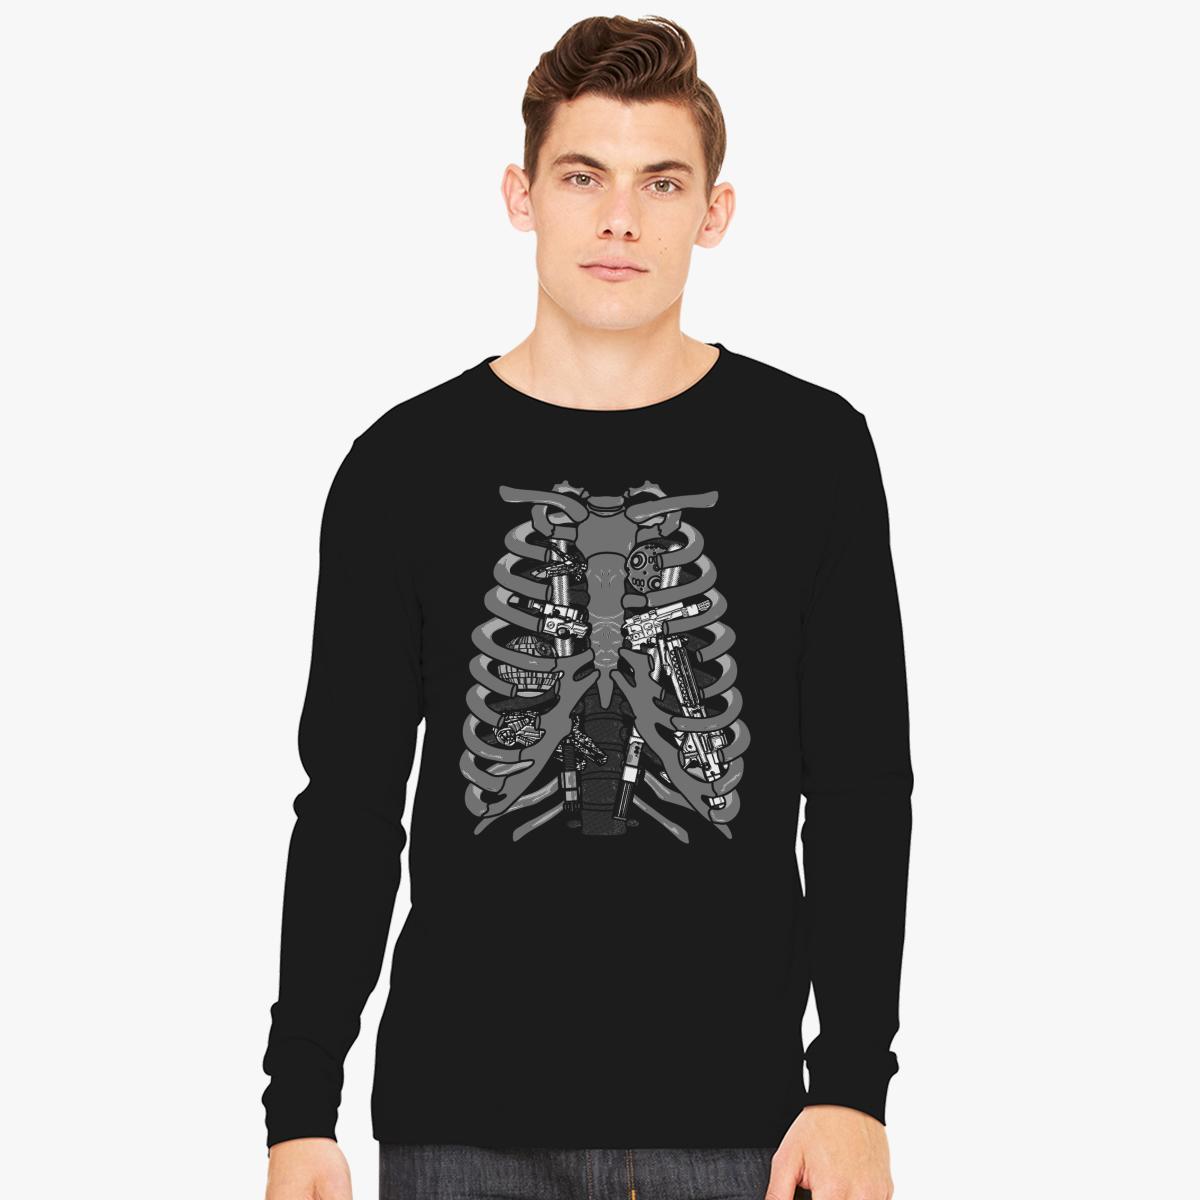 Anatomy of a Galaxy Long Sleeve T-shirt | Customon.com